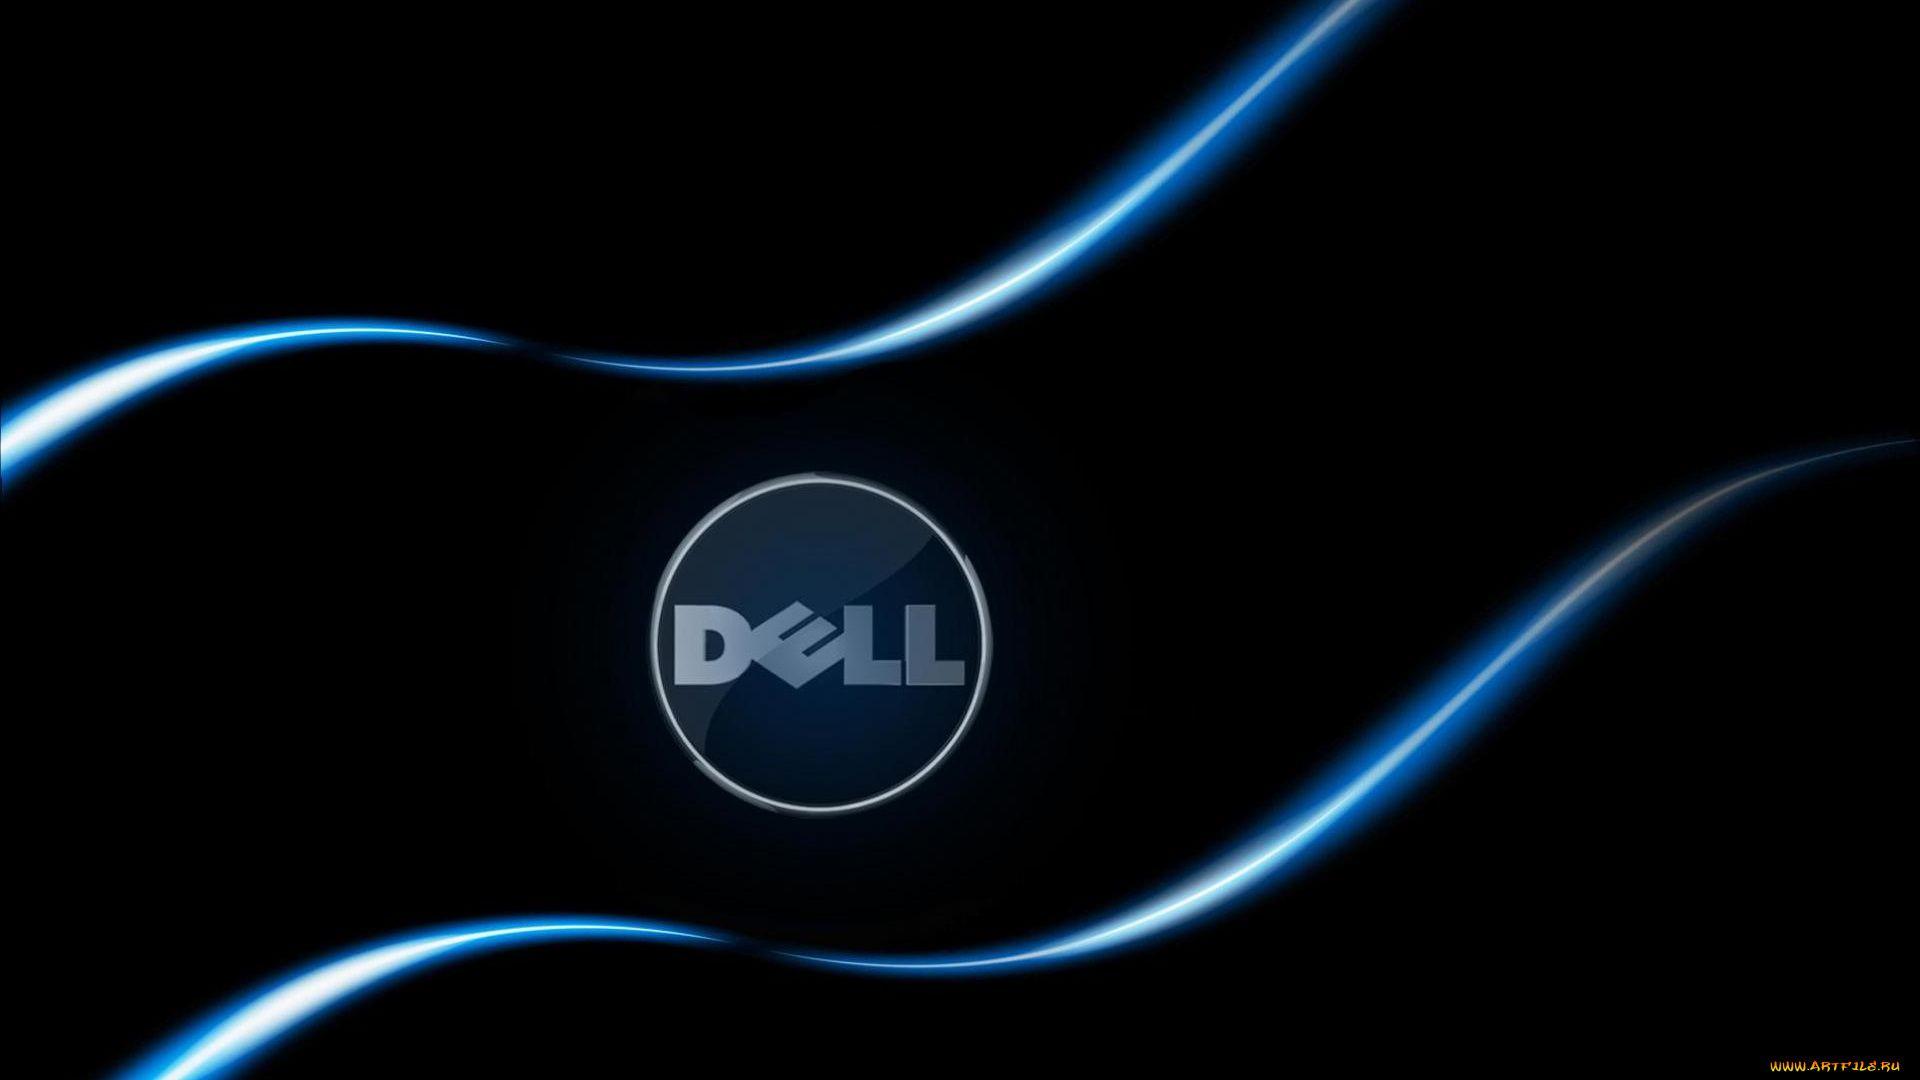 Dell desktop image